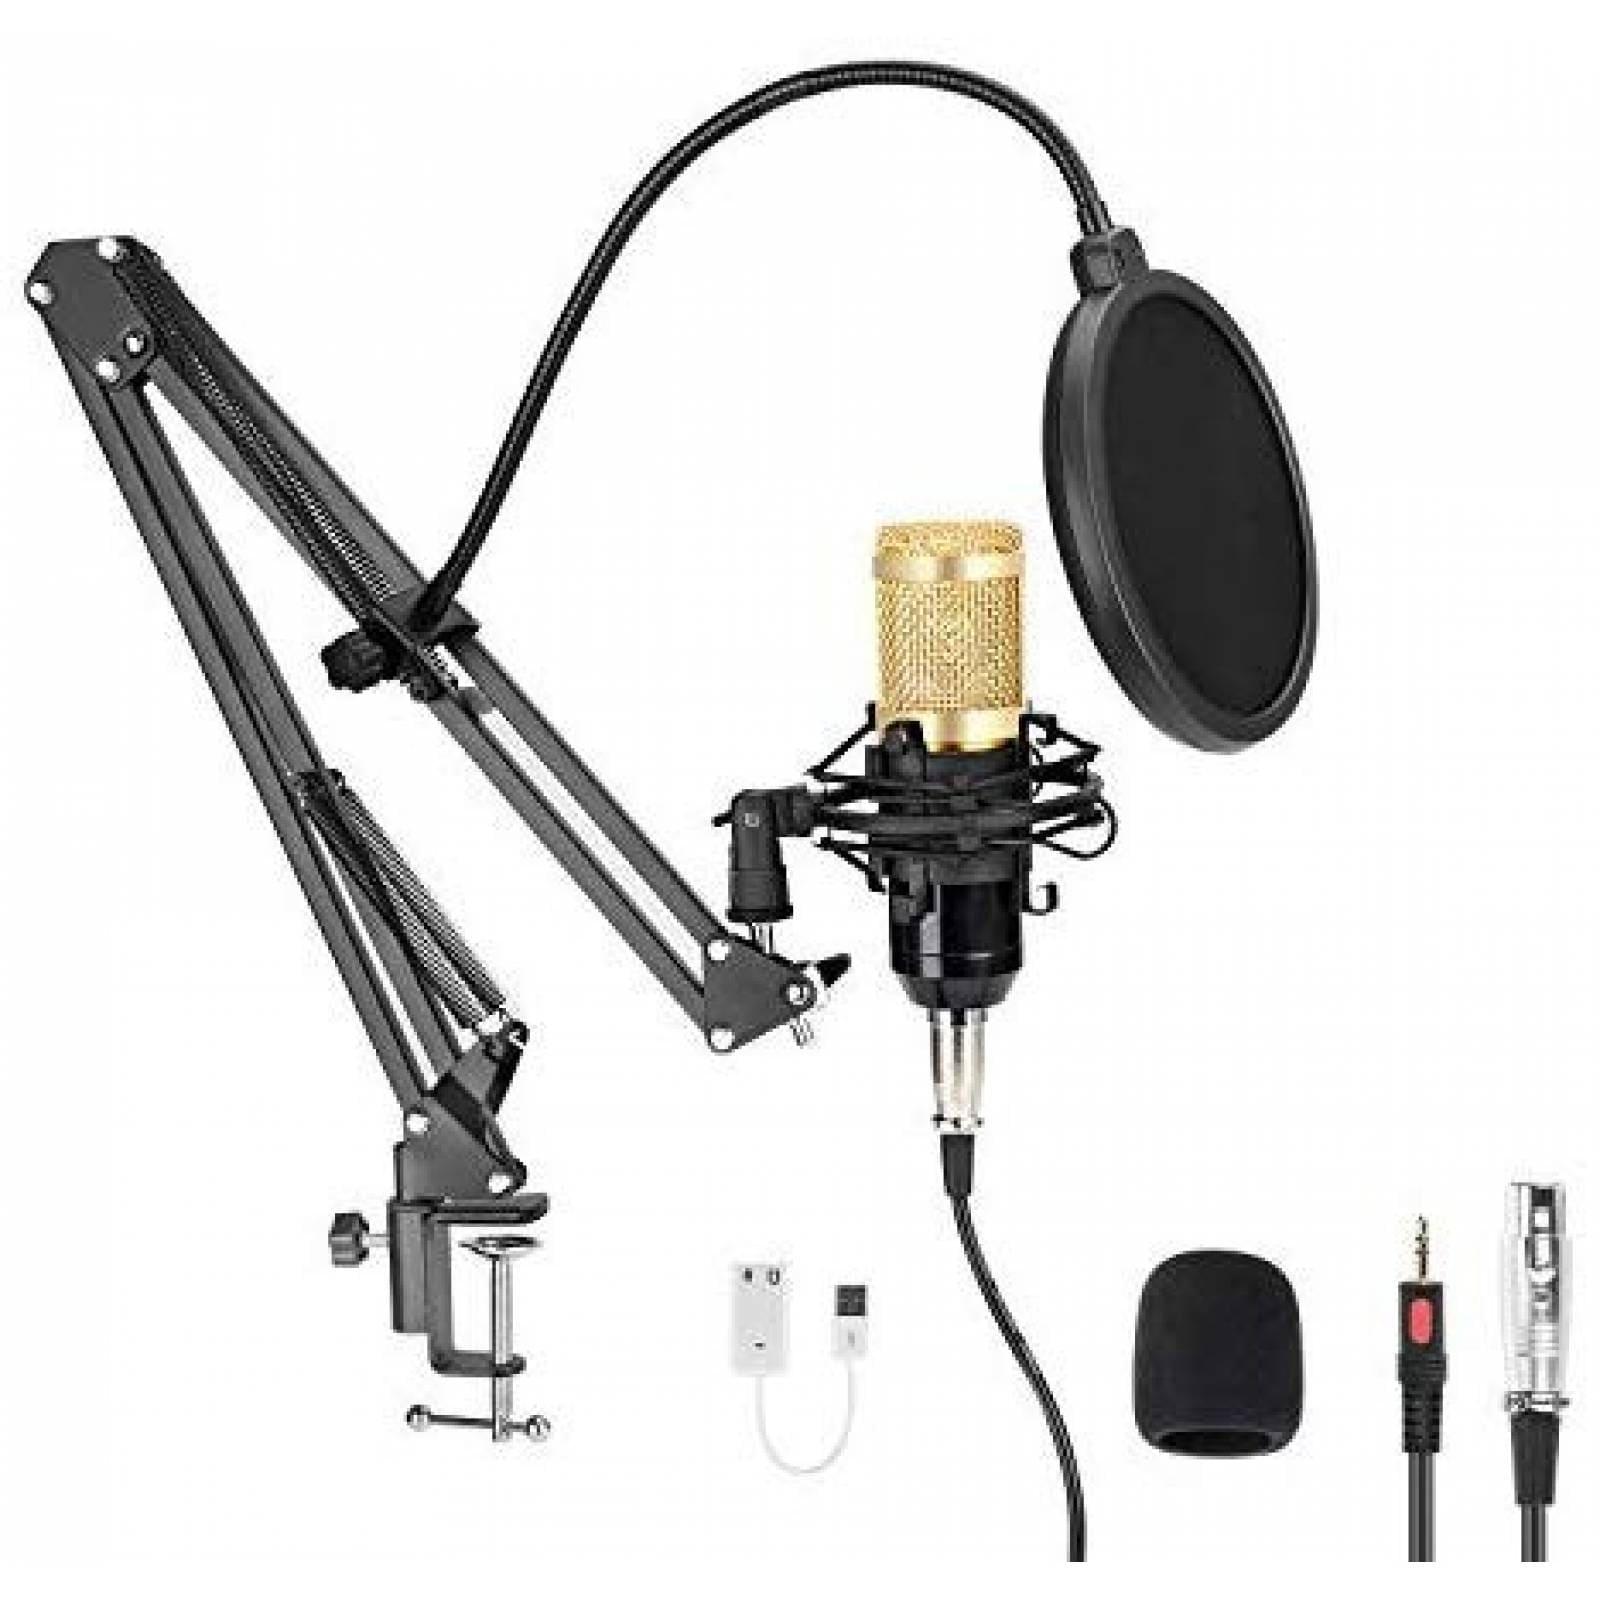 Micrófono MAYOGA de PC USB 96KHZ/24Bit con Brazo y Filtro